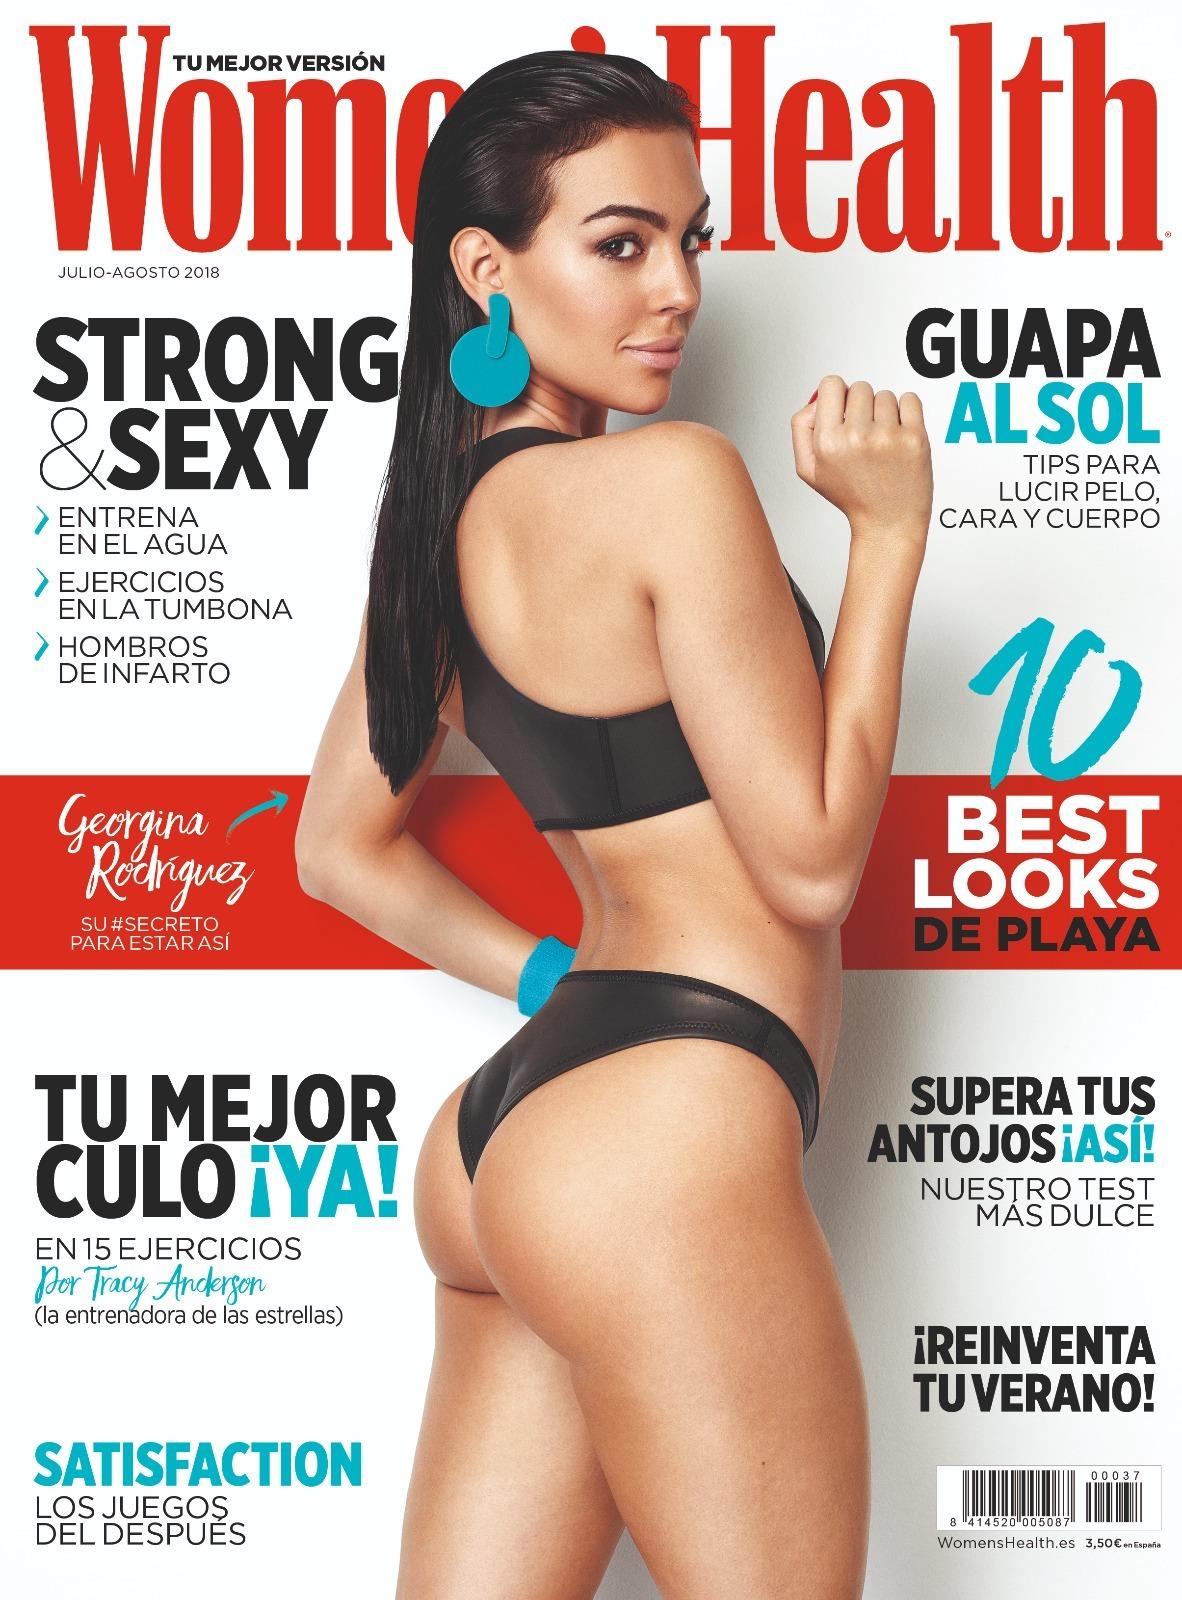 Resultado de imagen para Georgina Rodríguez portada de Women's Health